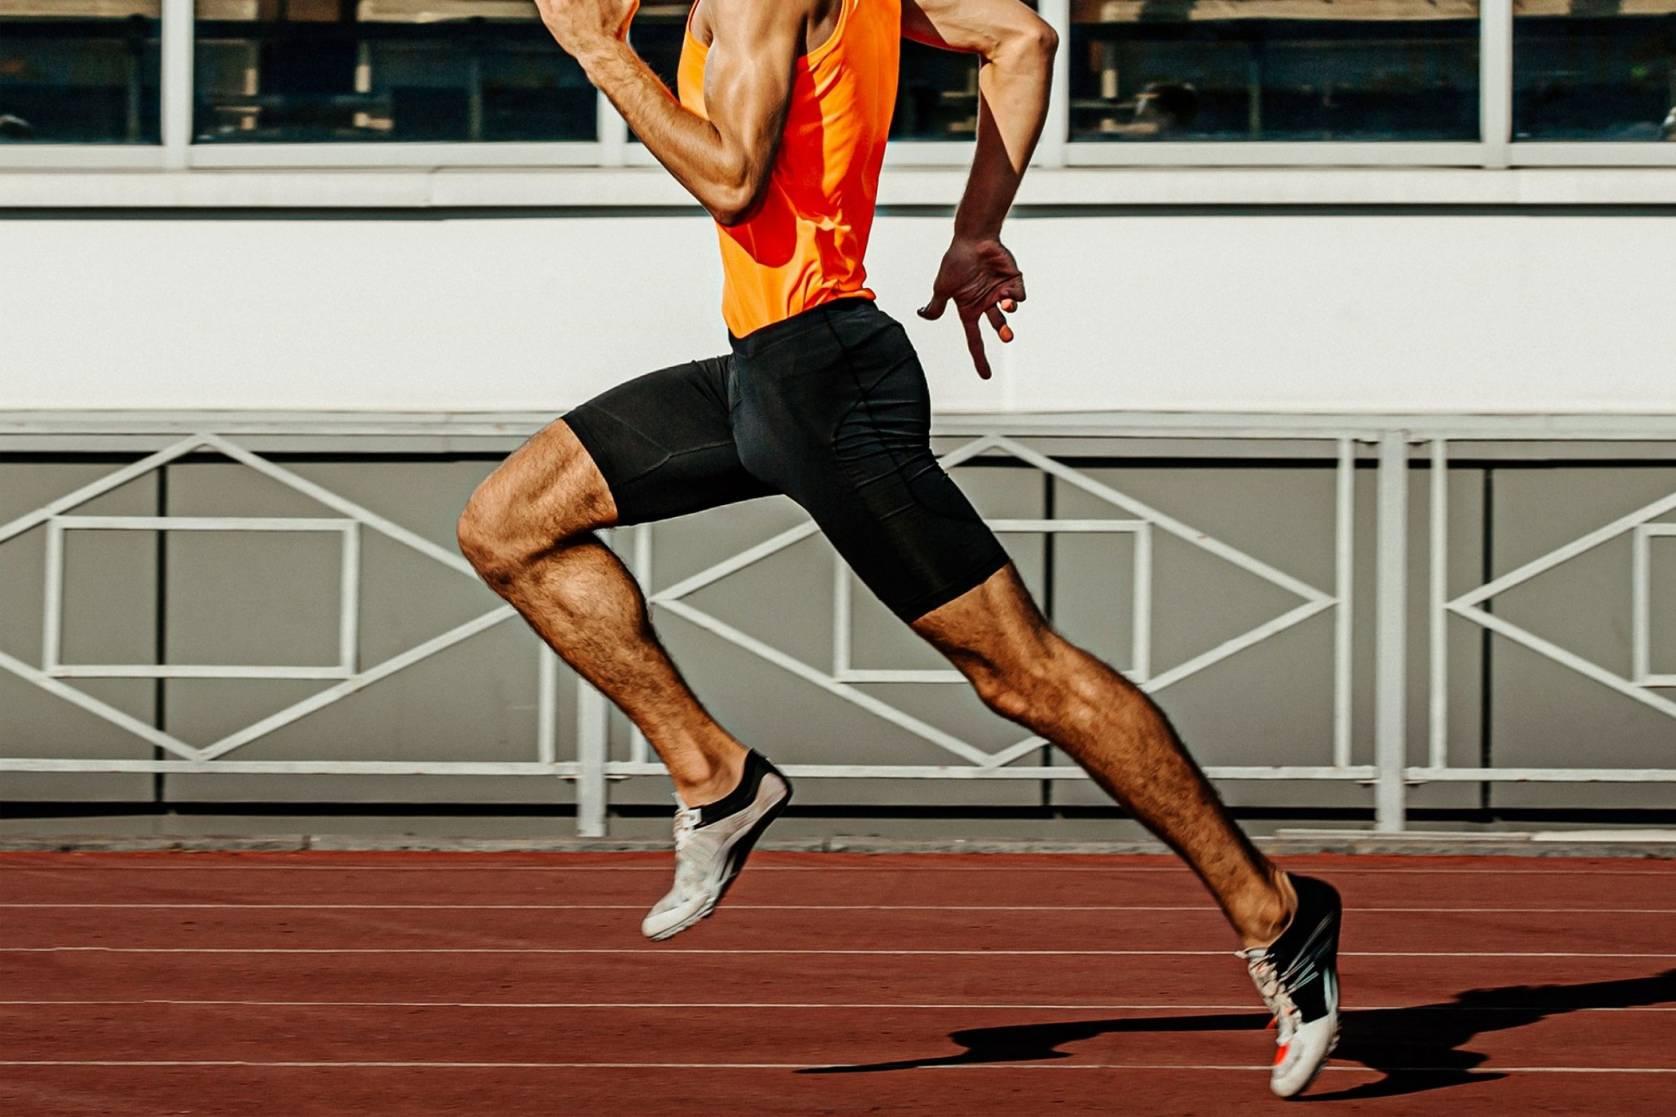 Pre's 30-40 Workout